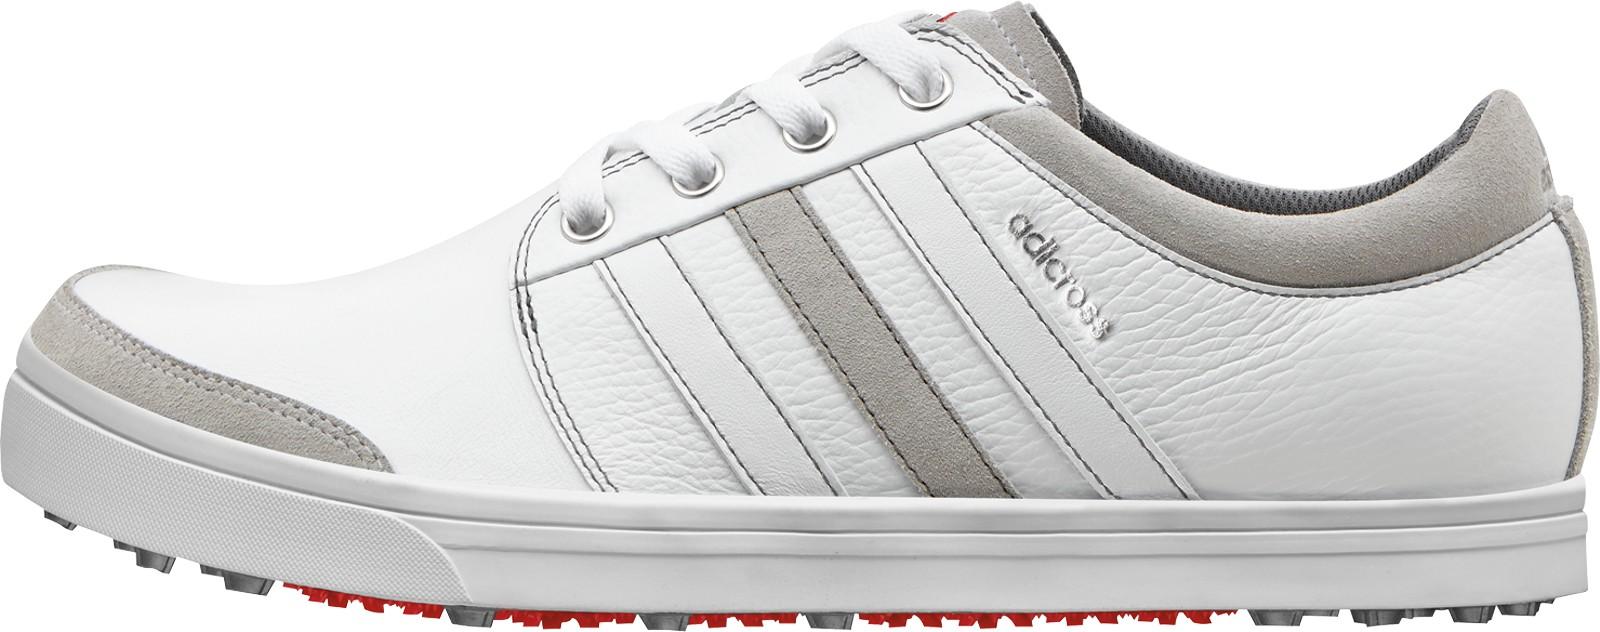 Adidas adicross gripmore pánské boty, bílo/šedé standardní, bílá, 7